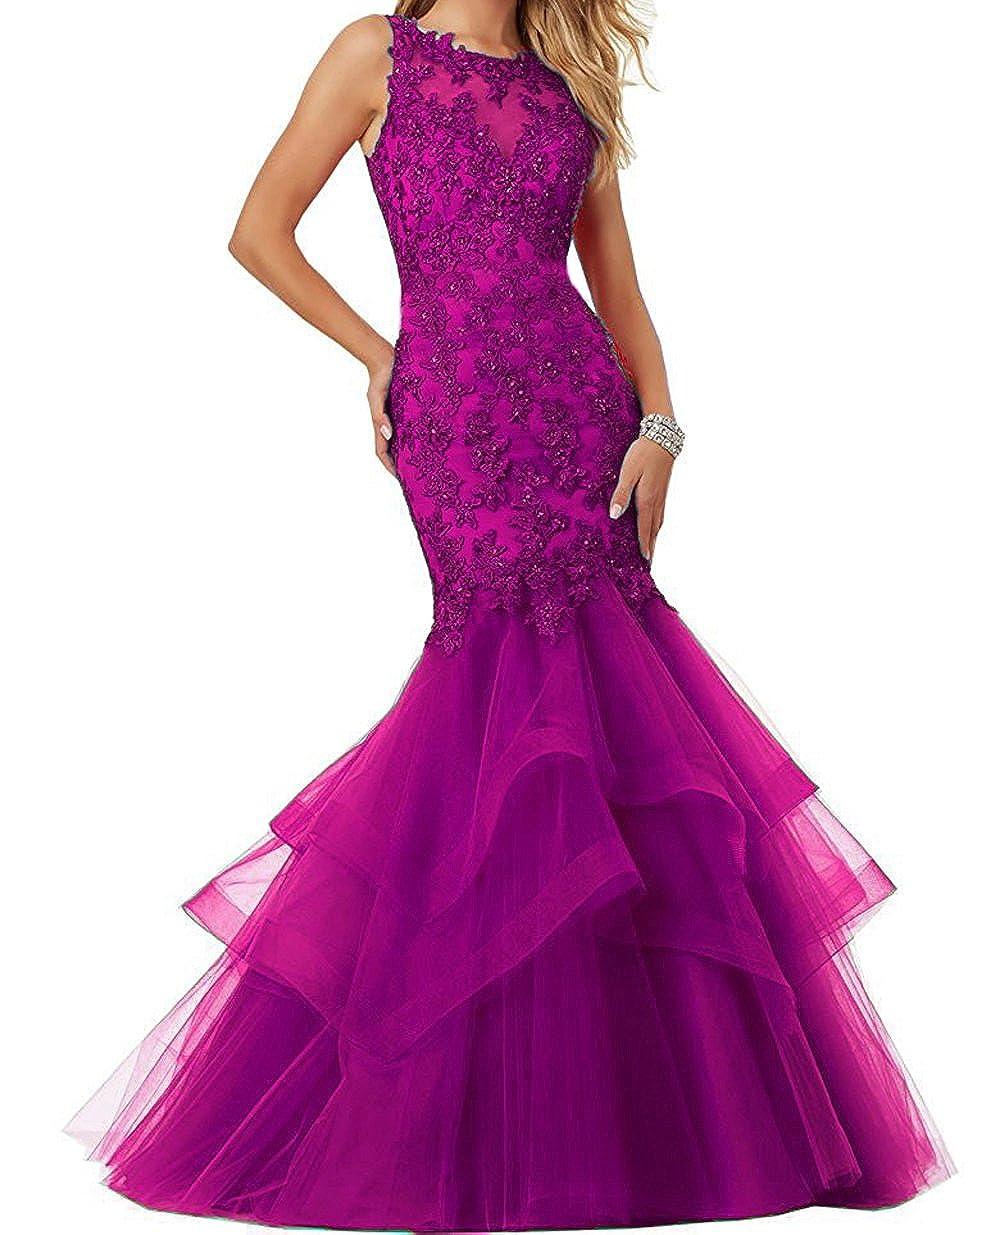 Dark Fuchsia Ellenhouse Women's Applique Tulle Long Mermaid Prom Party Evening Dresses EL189